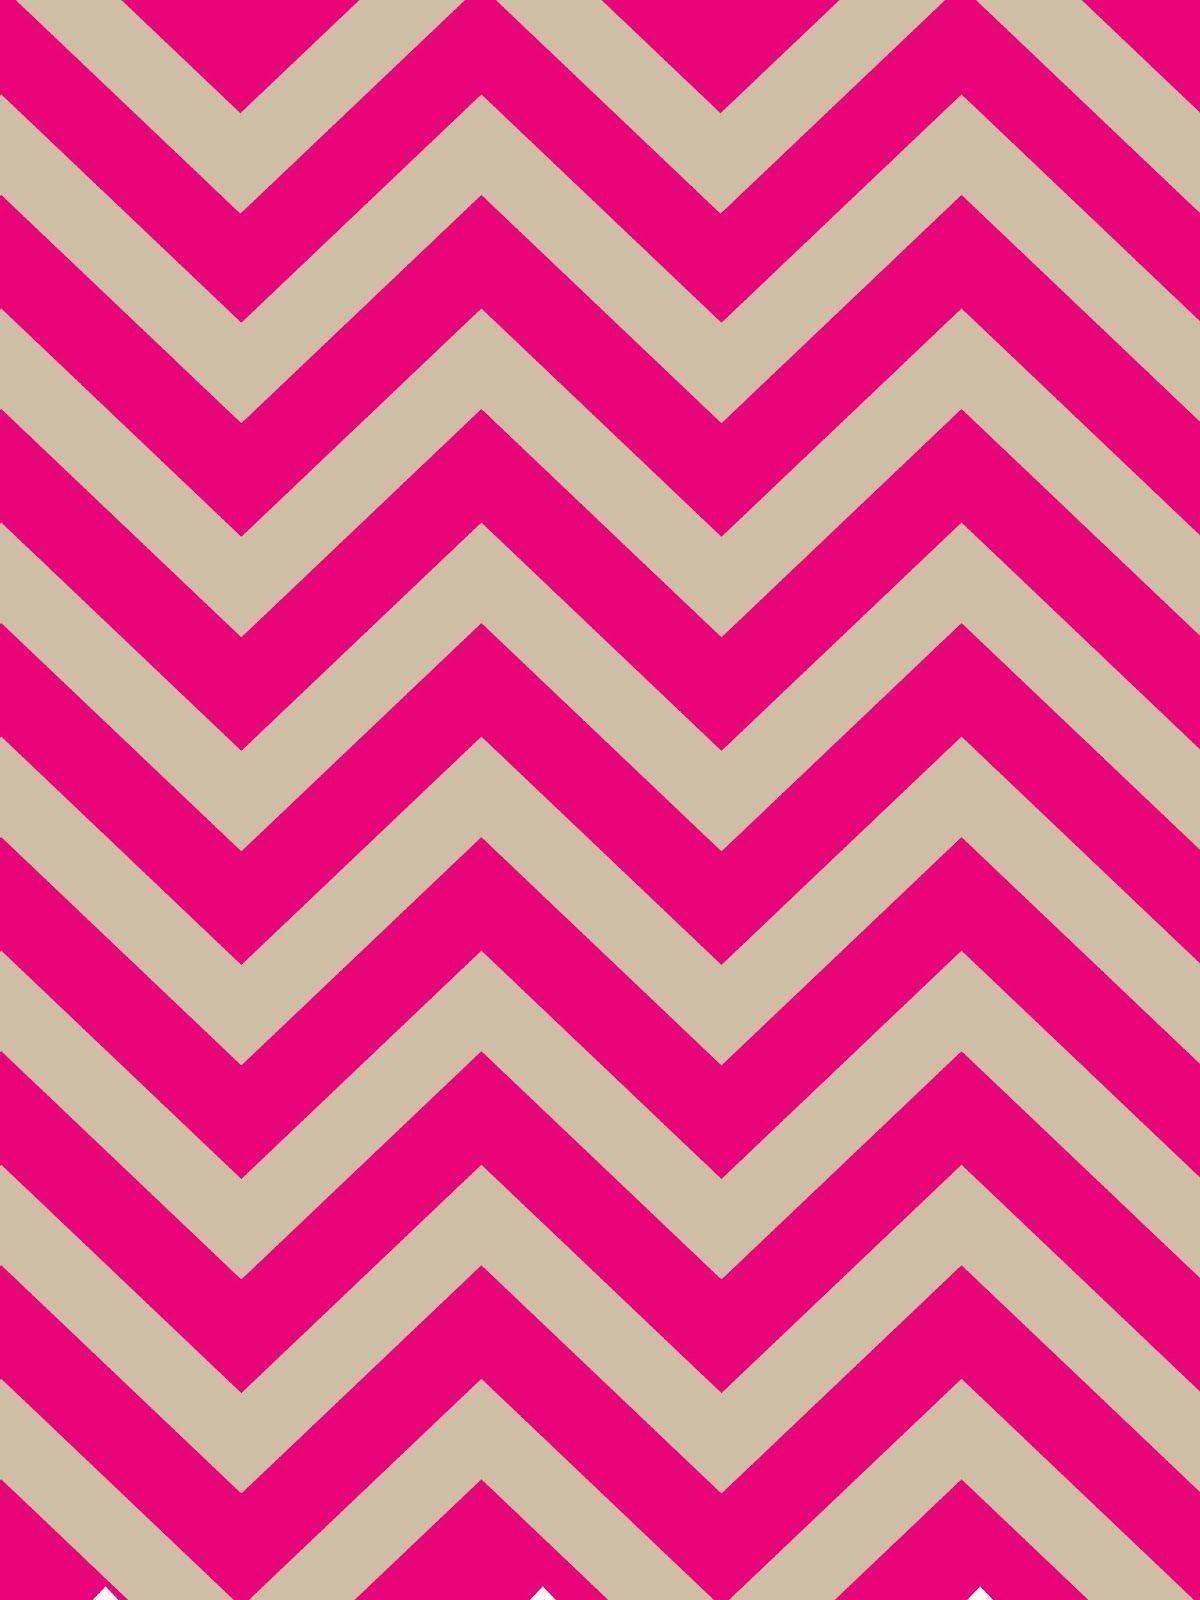 bright pink wallpaper - sf wallpaper